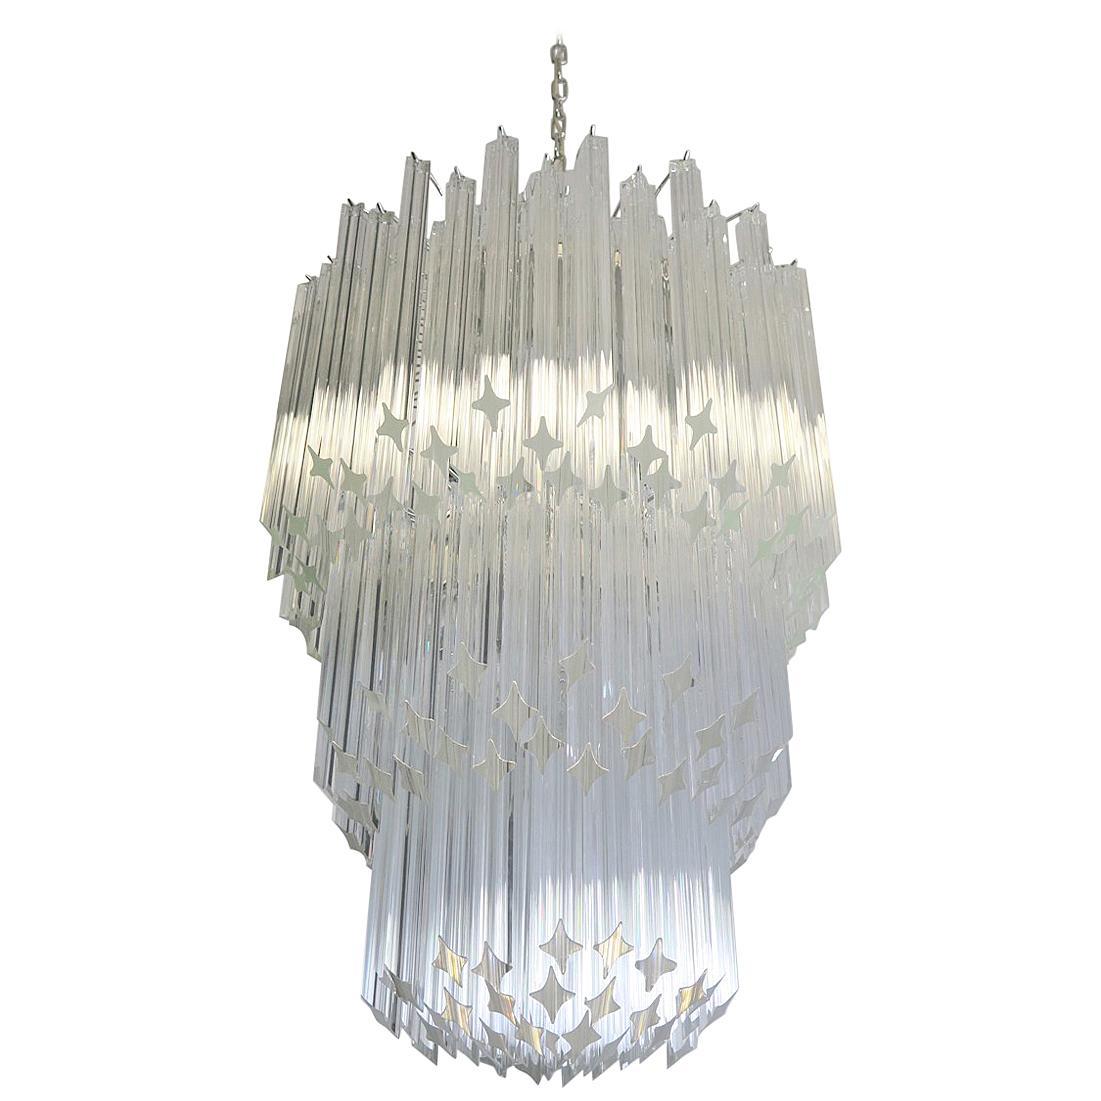 Huge Murano Chandelier Trasparent Quadriedri, 182 Prism, Elena Model